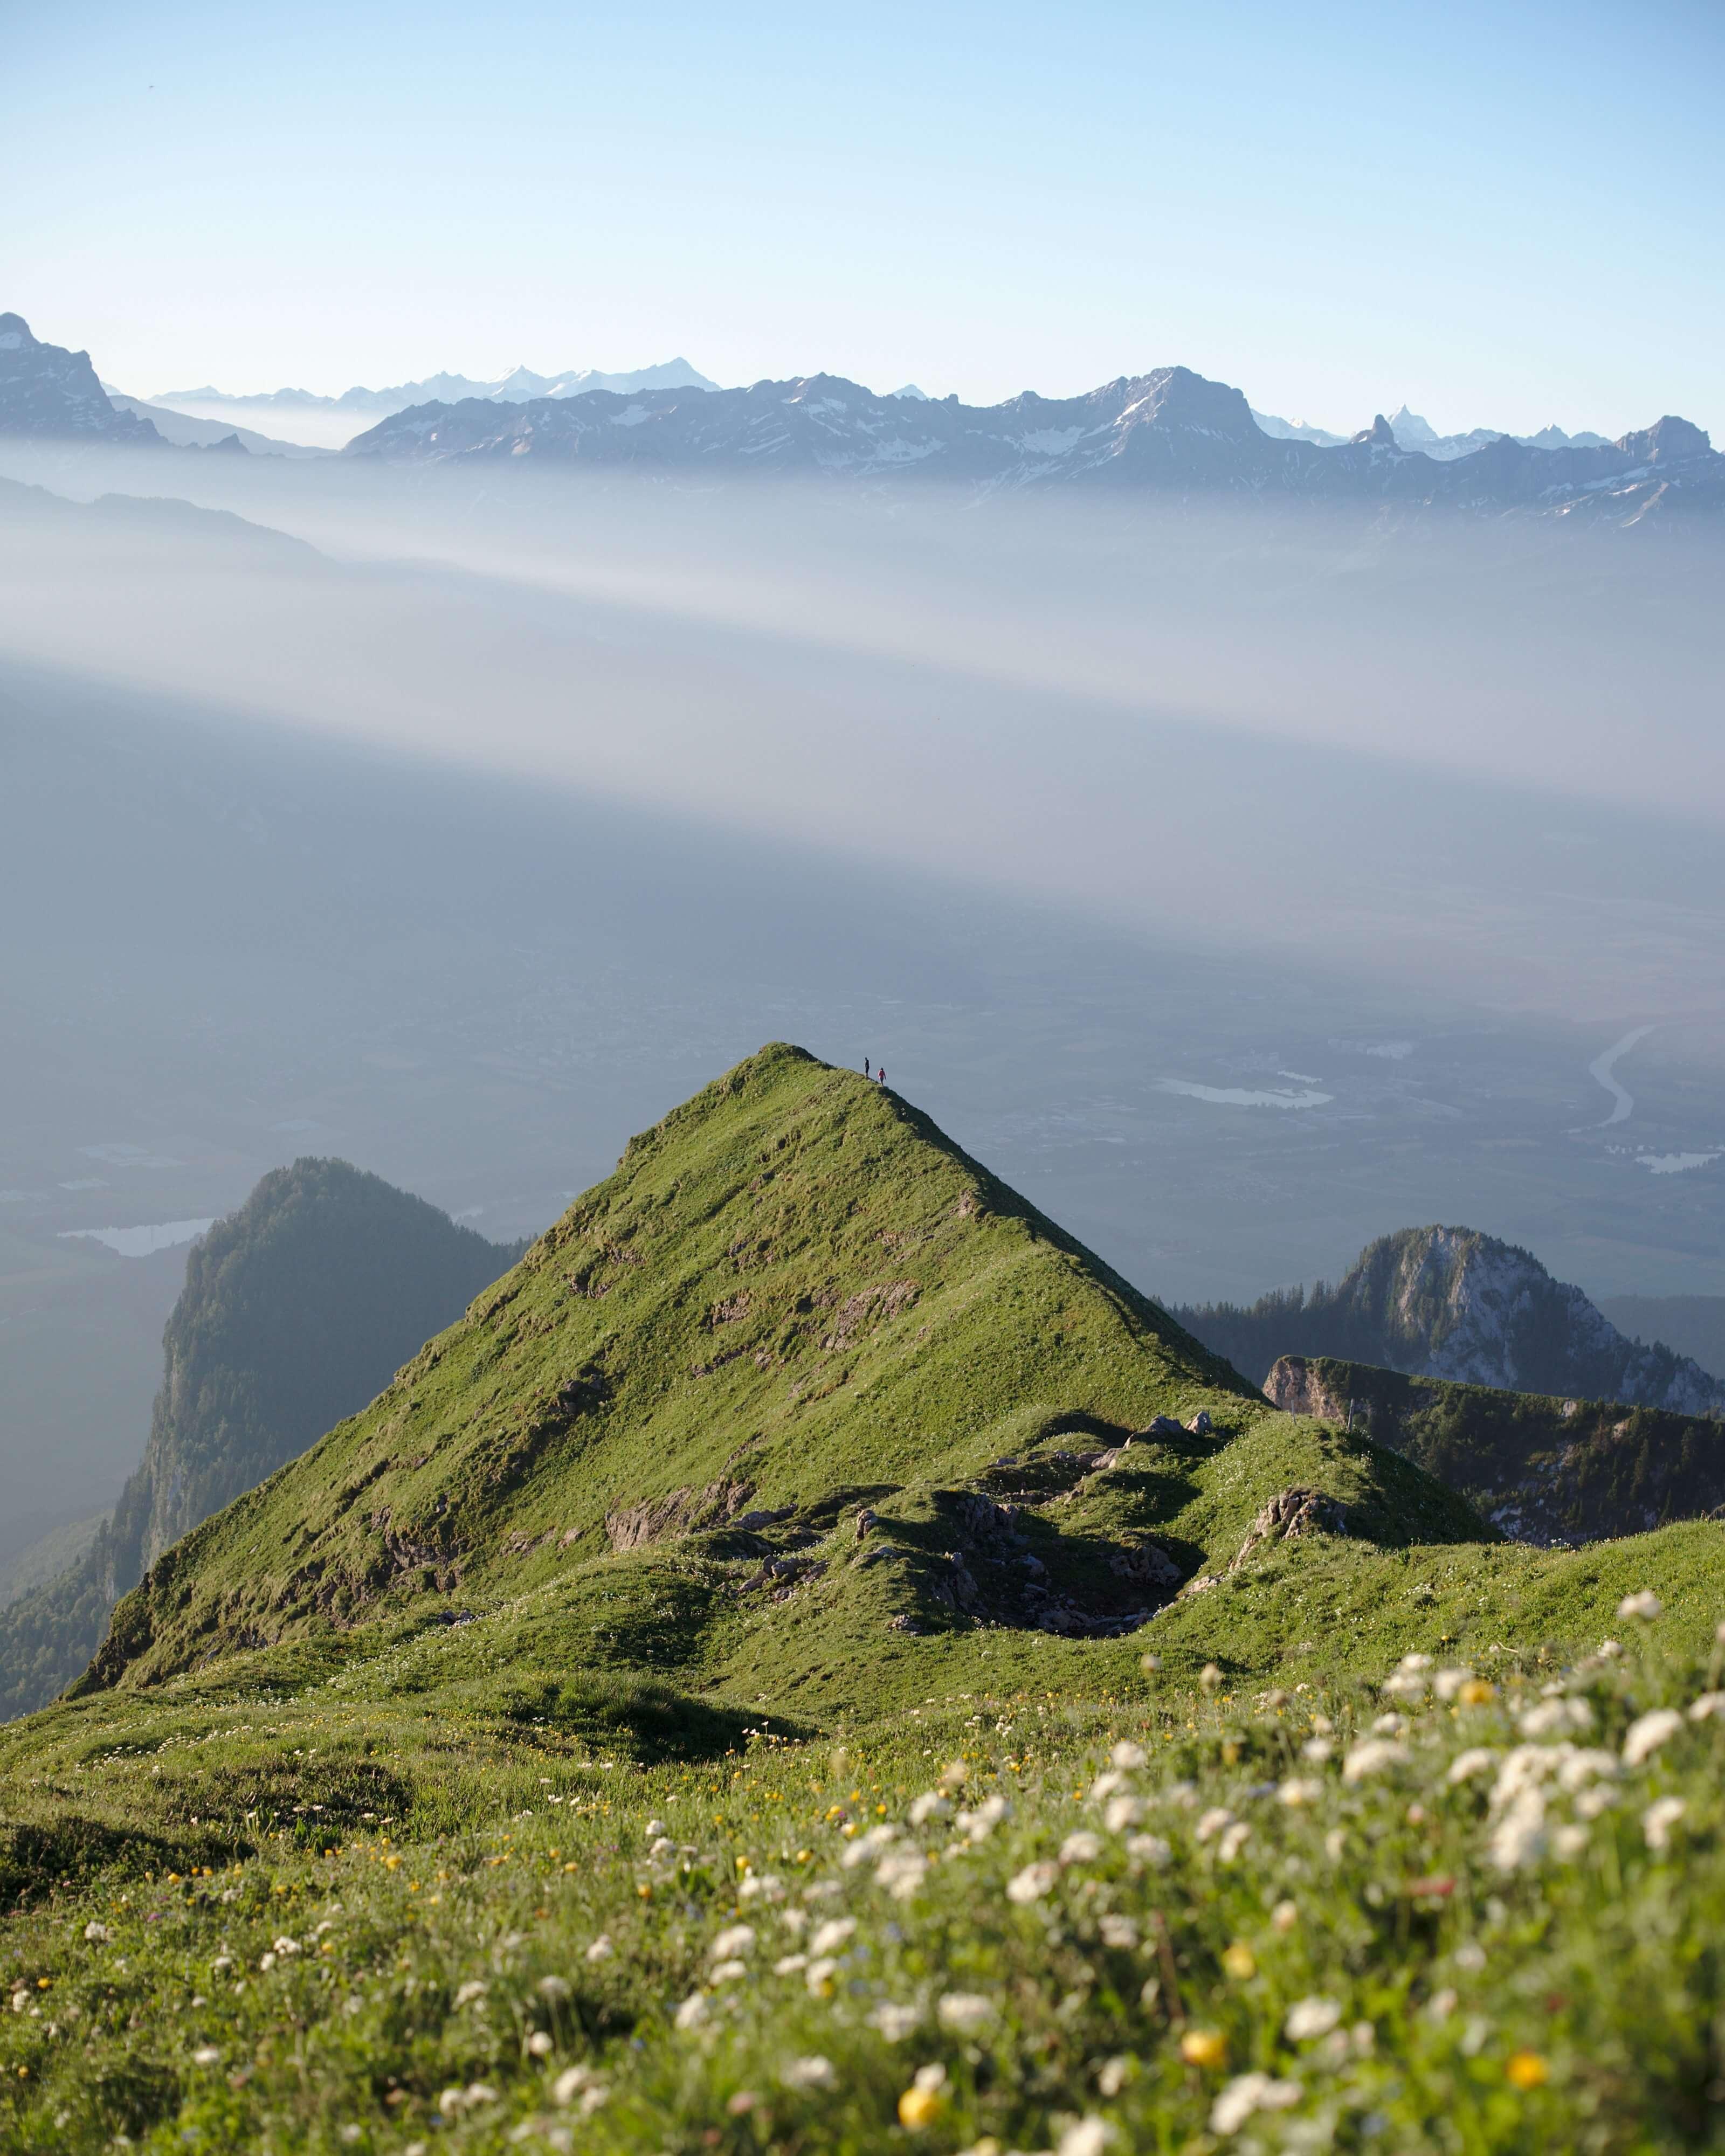 grammont suisse